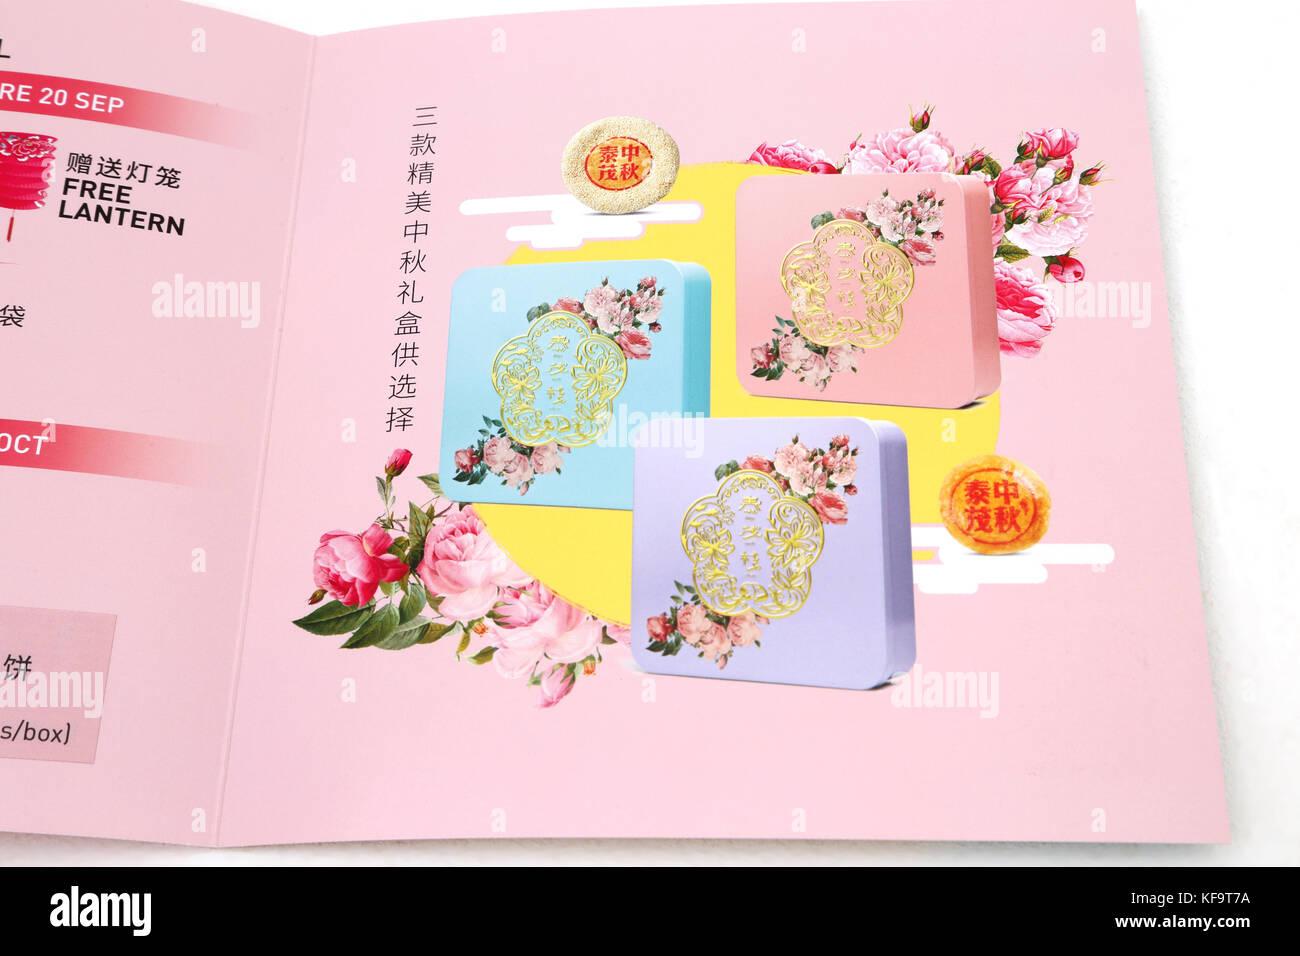 Thye Moh Chan librito mostrando Teochew Mooncakes Sets de Regalo Foto de stock